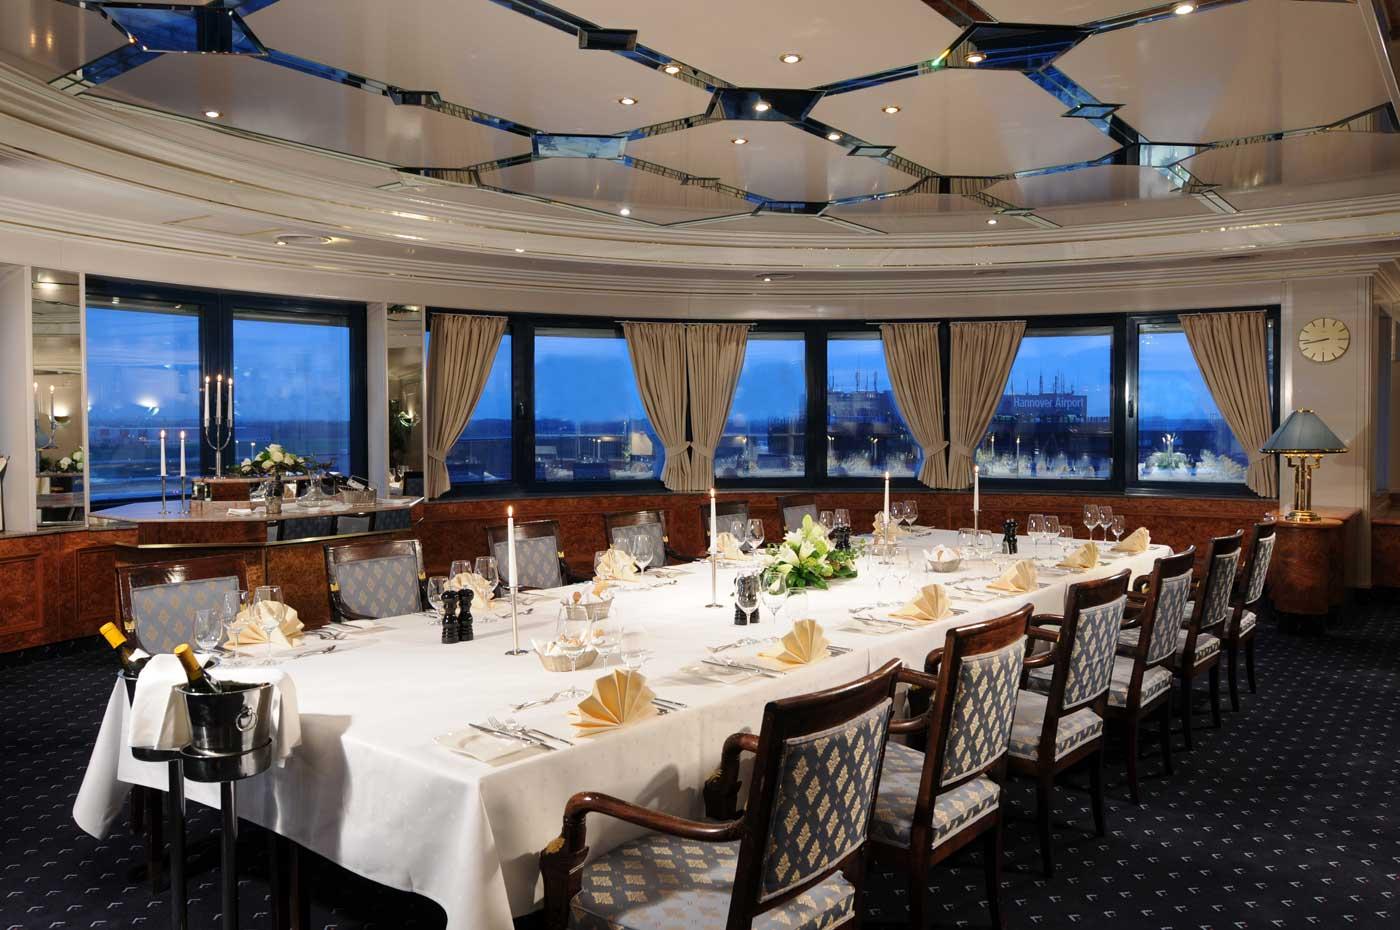 Club Lounge Im Maritim Airport Hotel Hannover Video